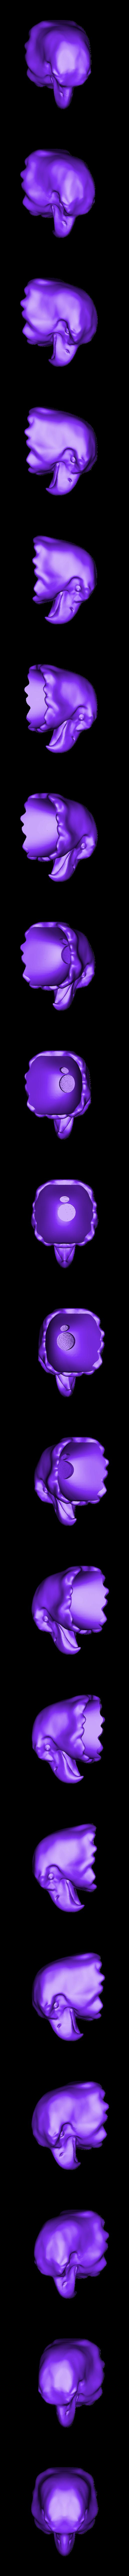 Bald_Eagle_head.obj Download free OBJ file Eagle Lamp/Nightlight • 3D printable template, Pza4Rza